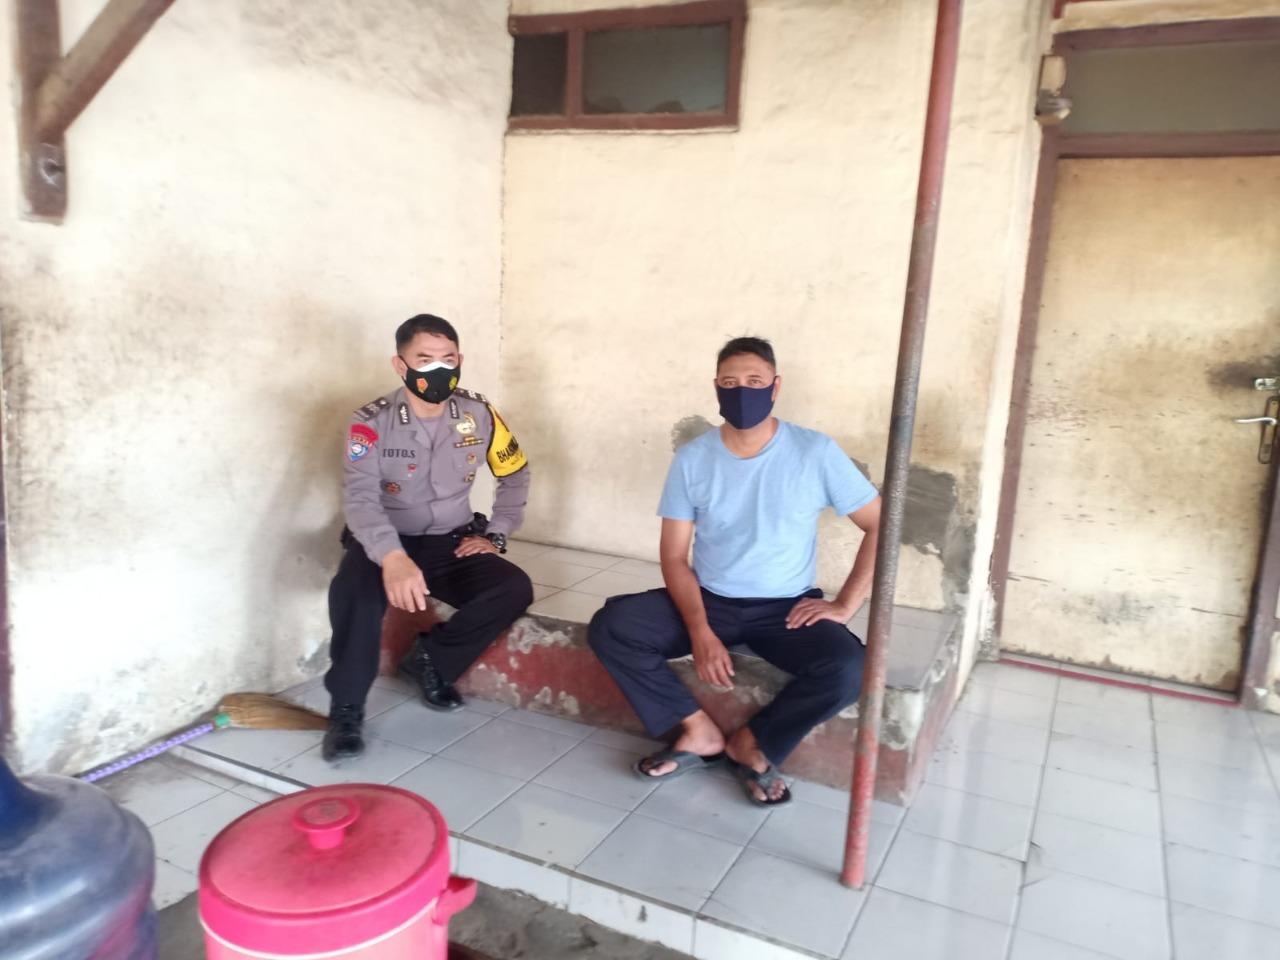 Jelang Pilwu 2021 Bhabin Tuk Polsek Kedawung Polres Ciko Himbau Warga, Ajak Harkamtibmas Serta Prokes